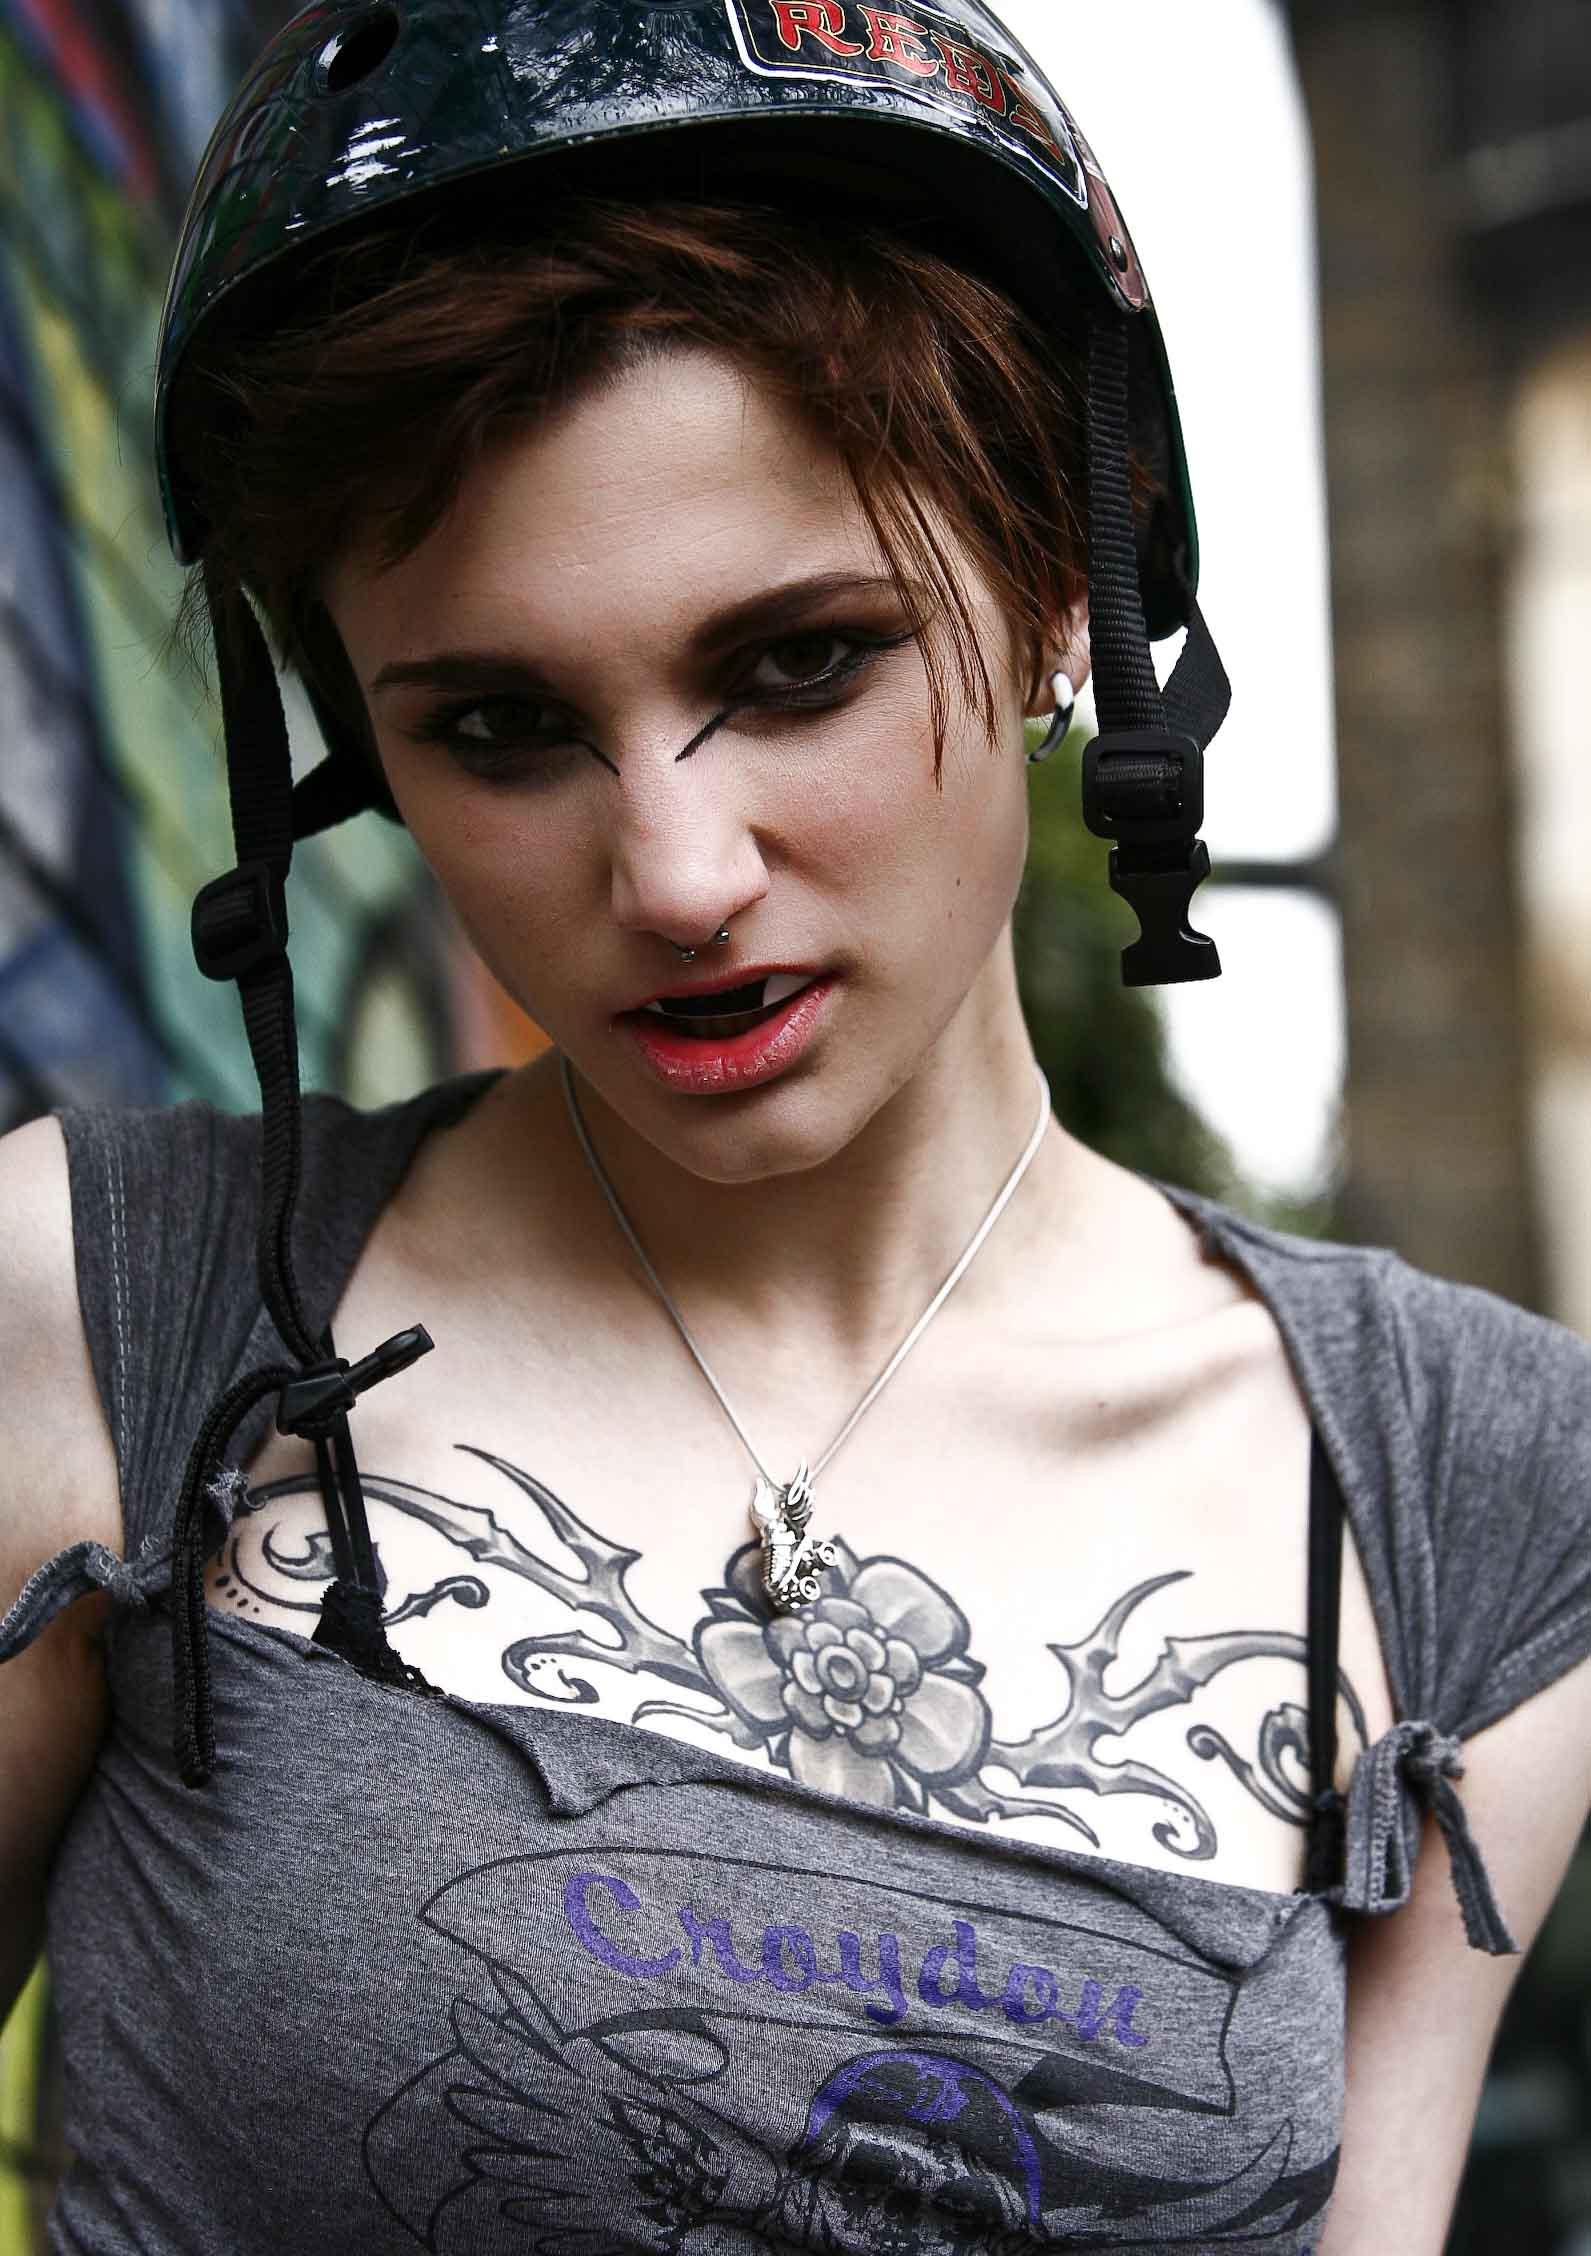 Silver-roller-derby-skate-necklace-model-Anna.jpg